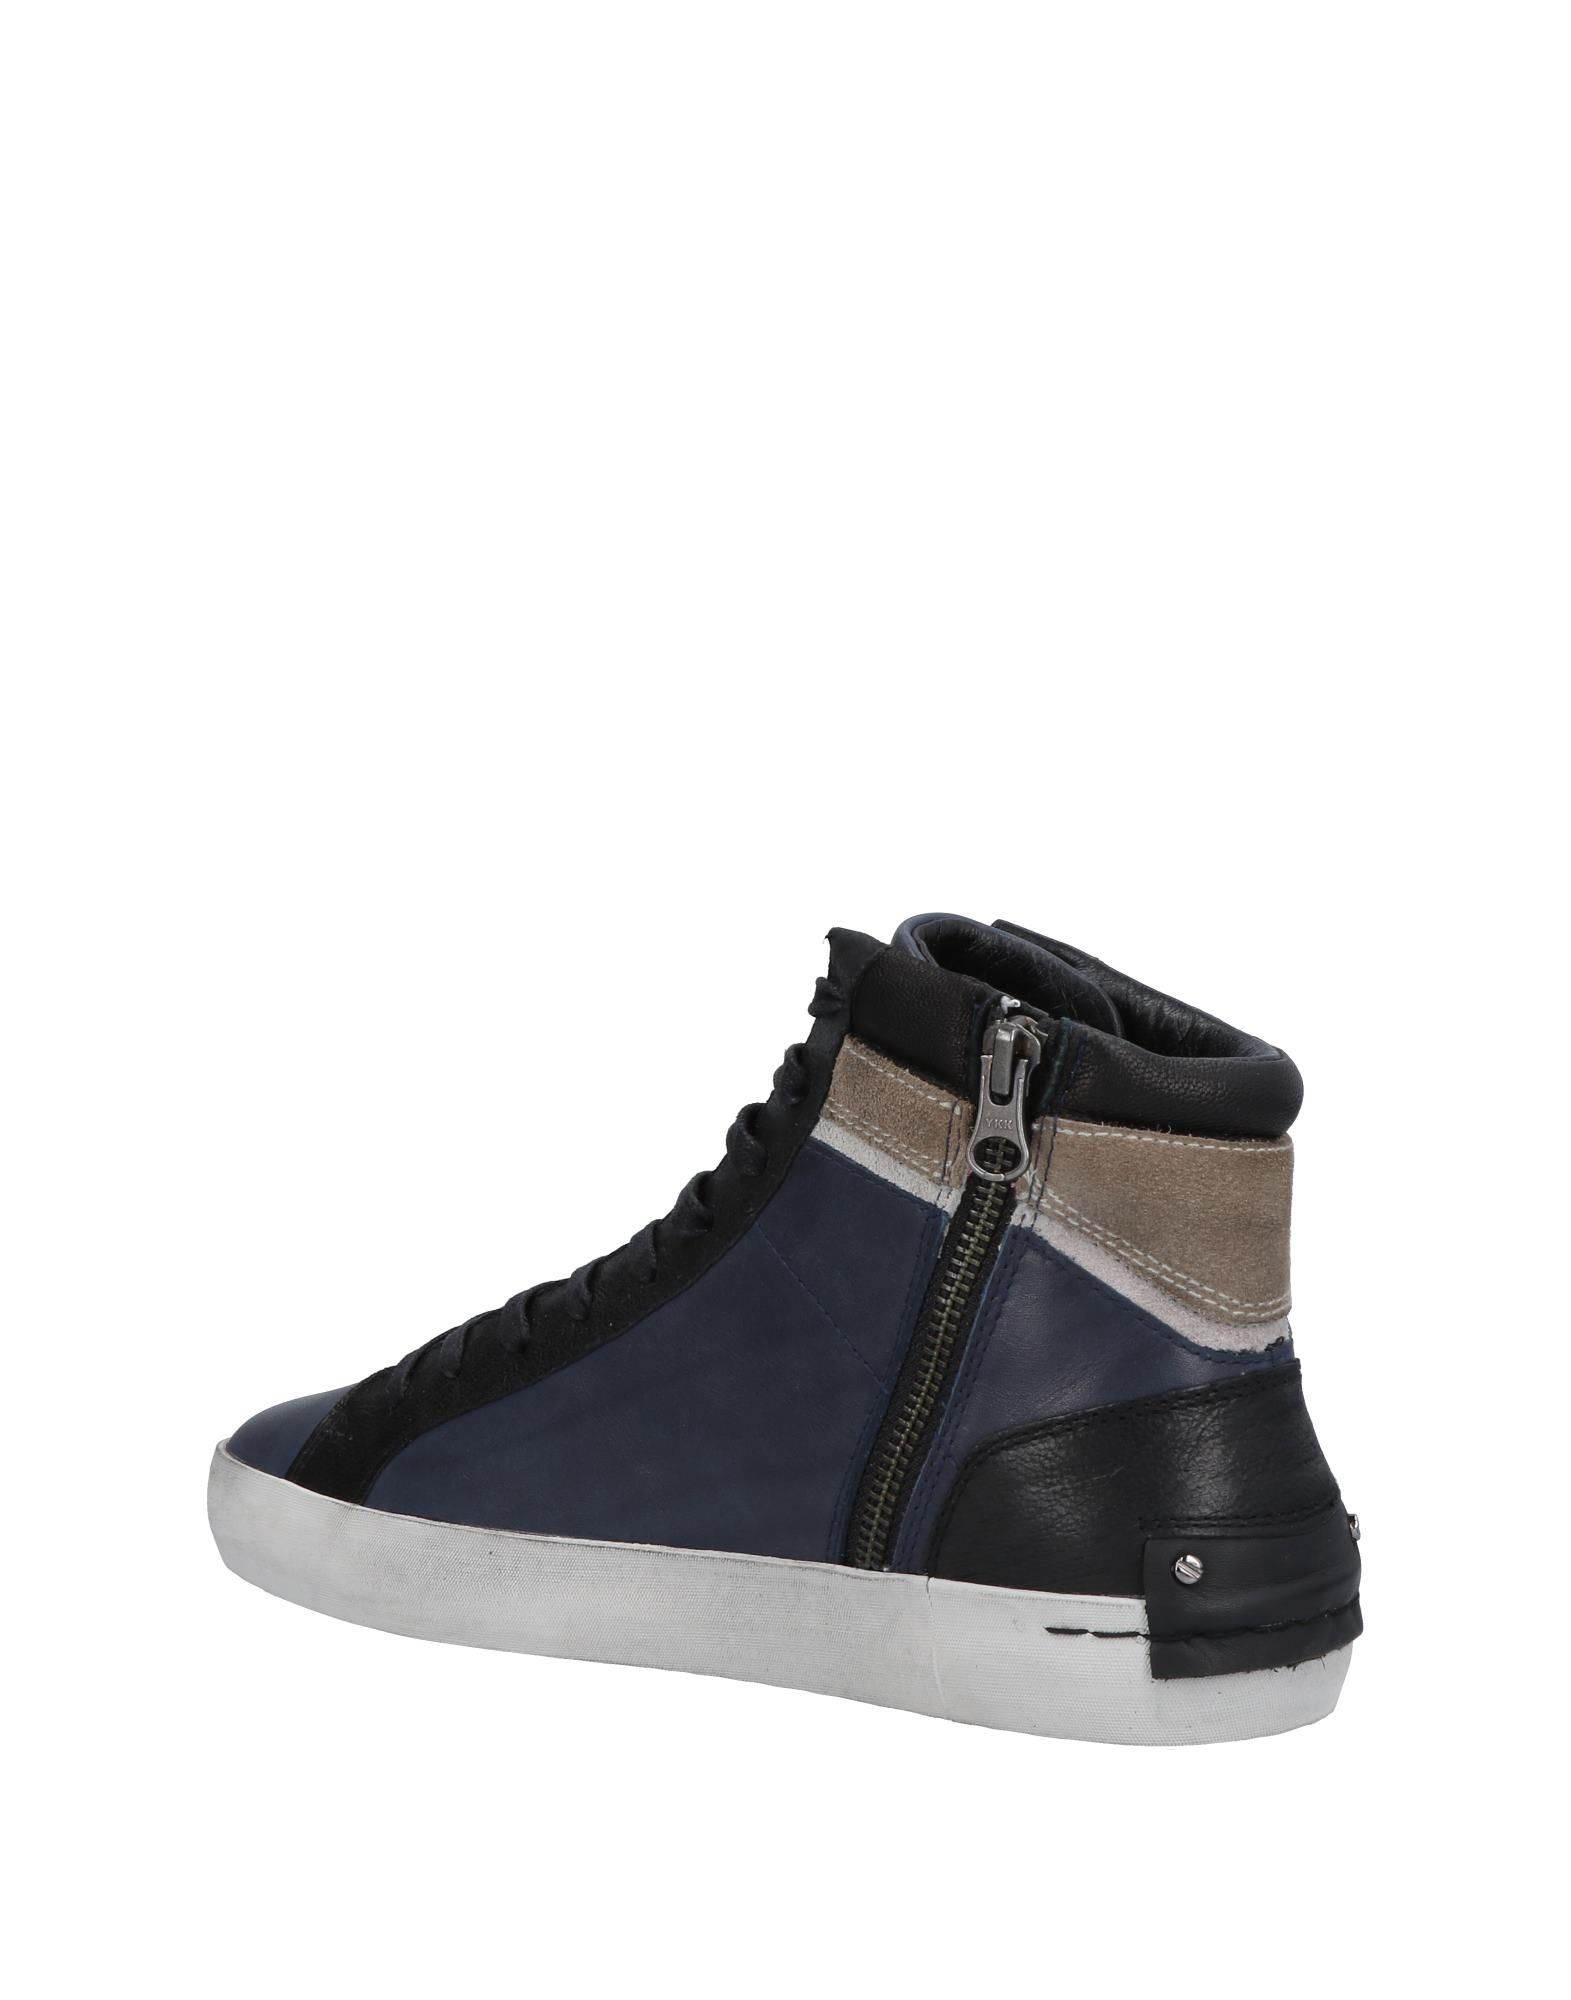 Crime London 11467150IW Sneakers Herren  11467150IW London Neue Schuhe 7d3cc3